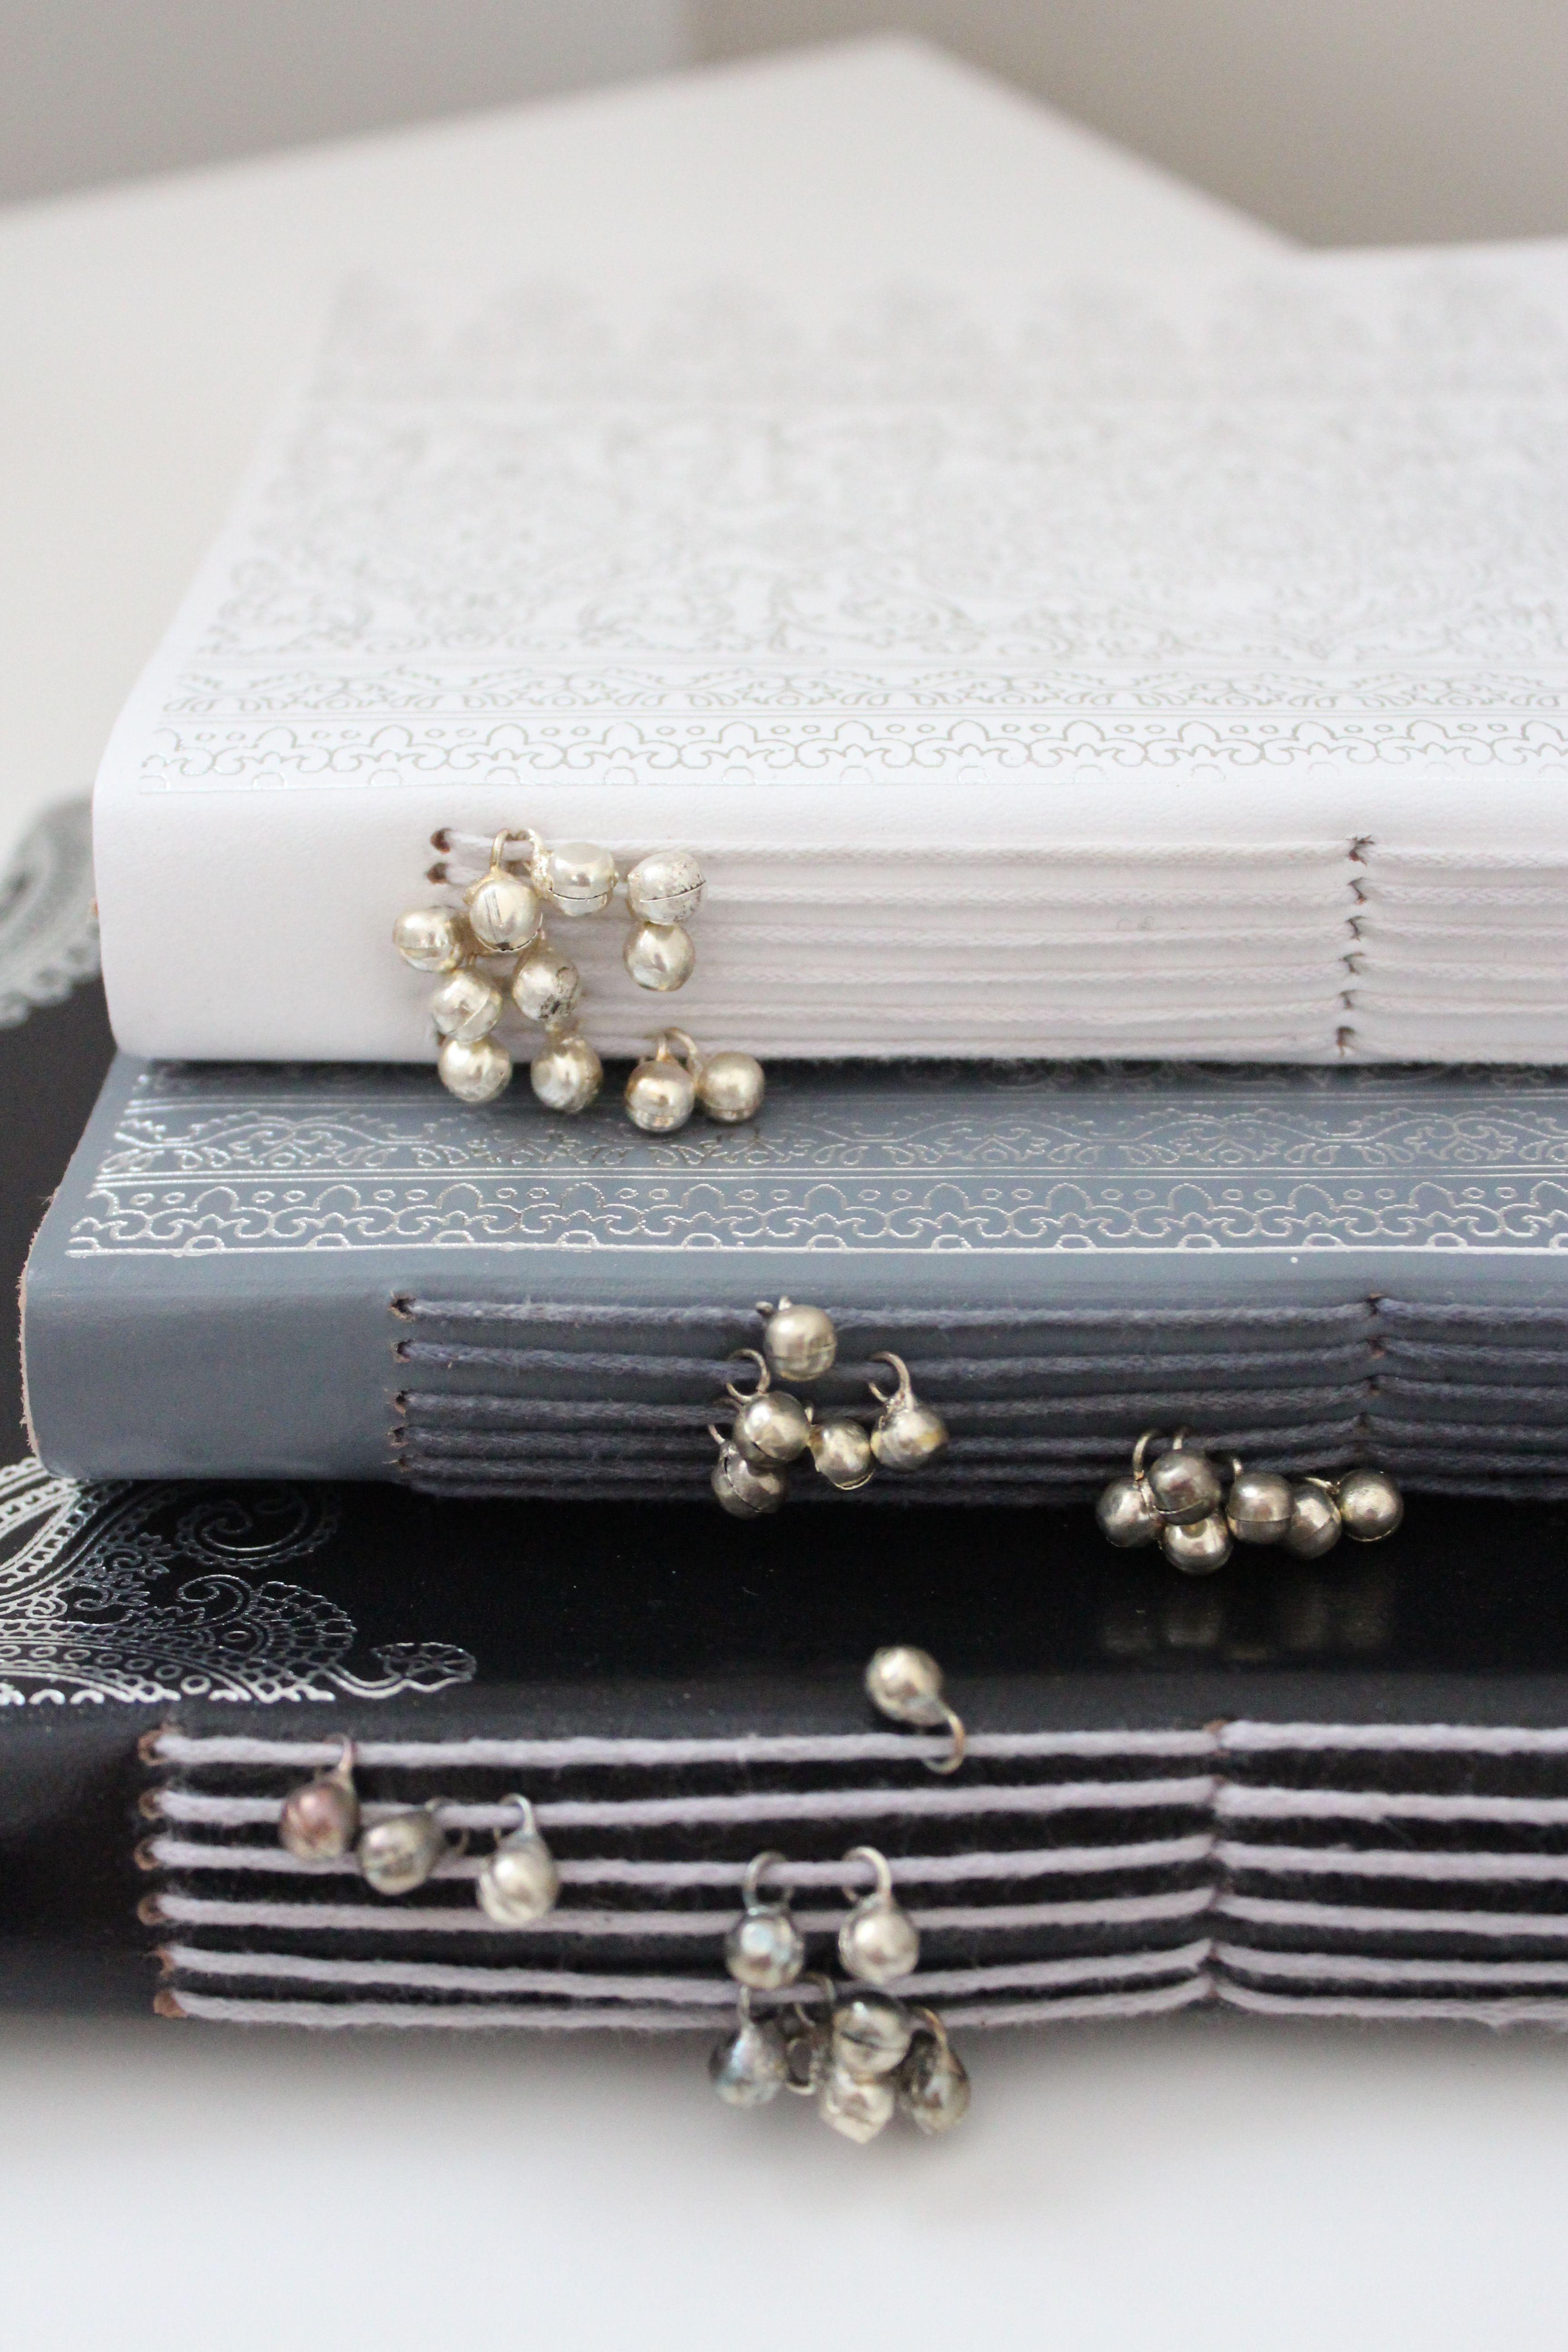 Zenza notebooks